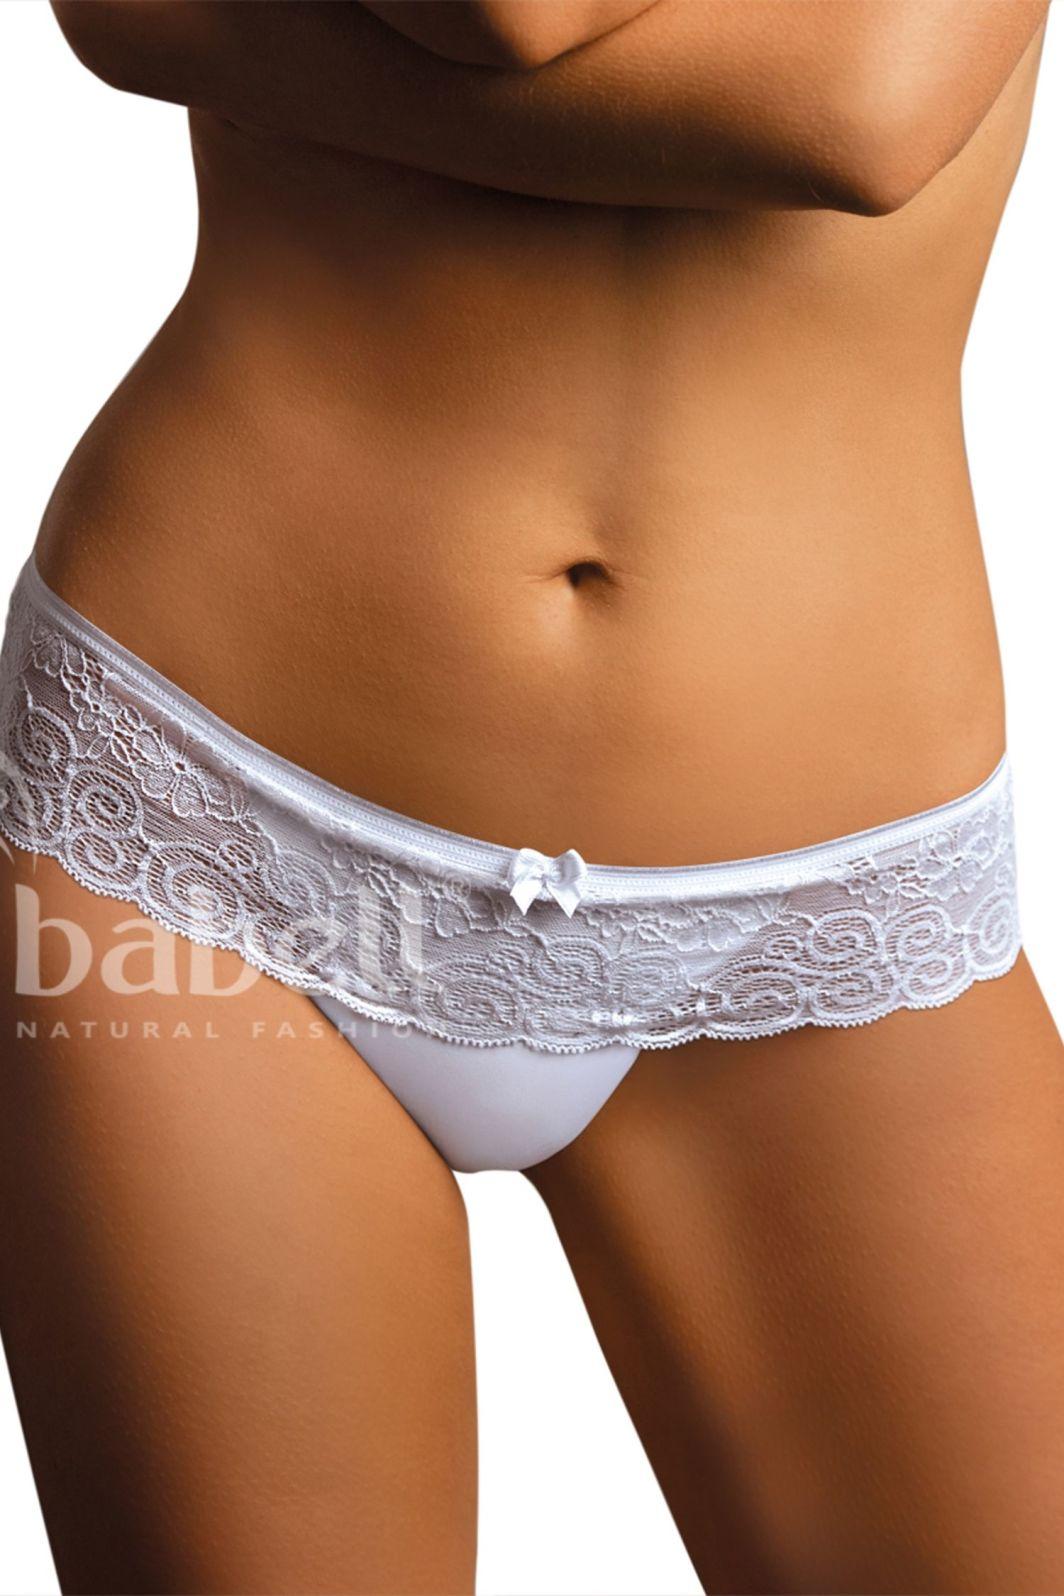 Babell Figi bbl 042 białe r. XL 1